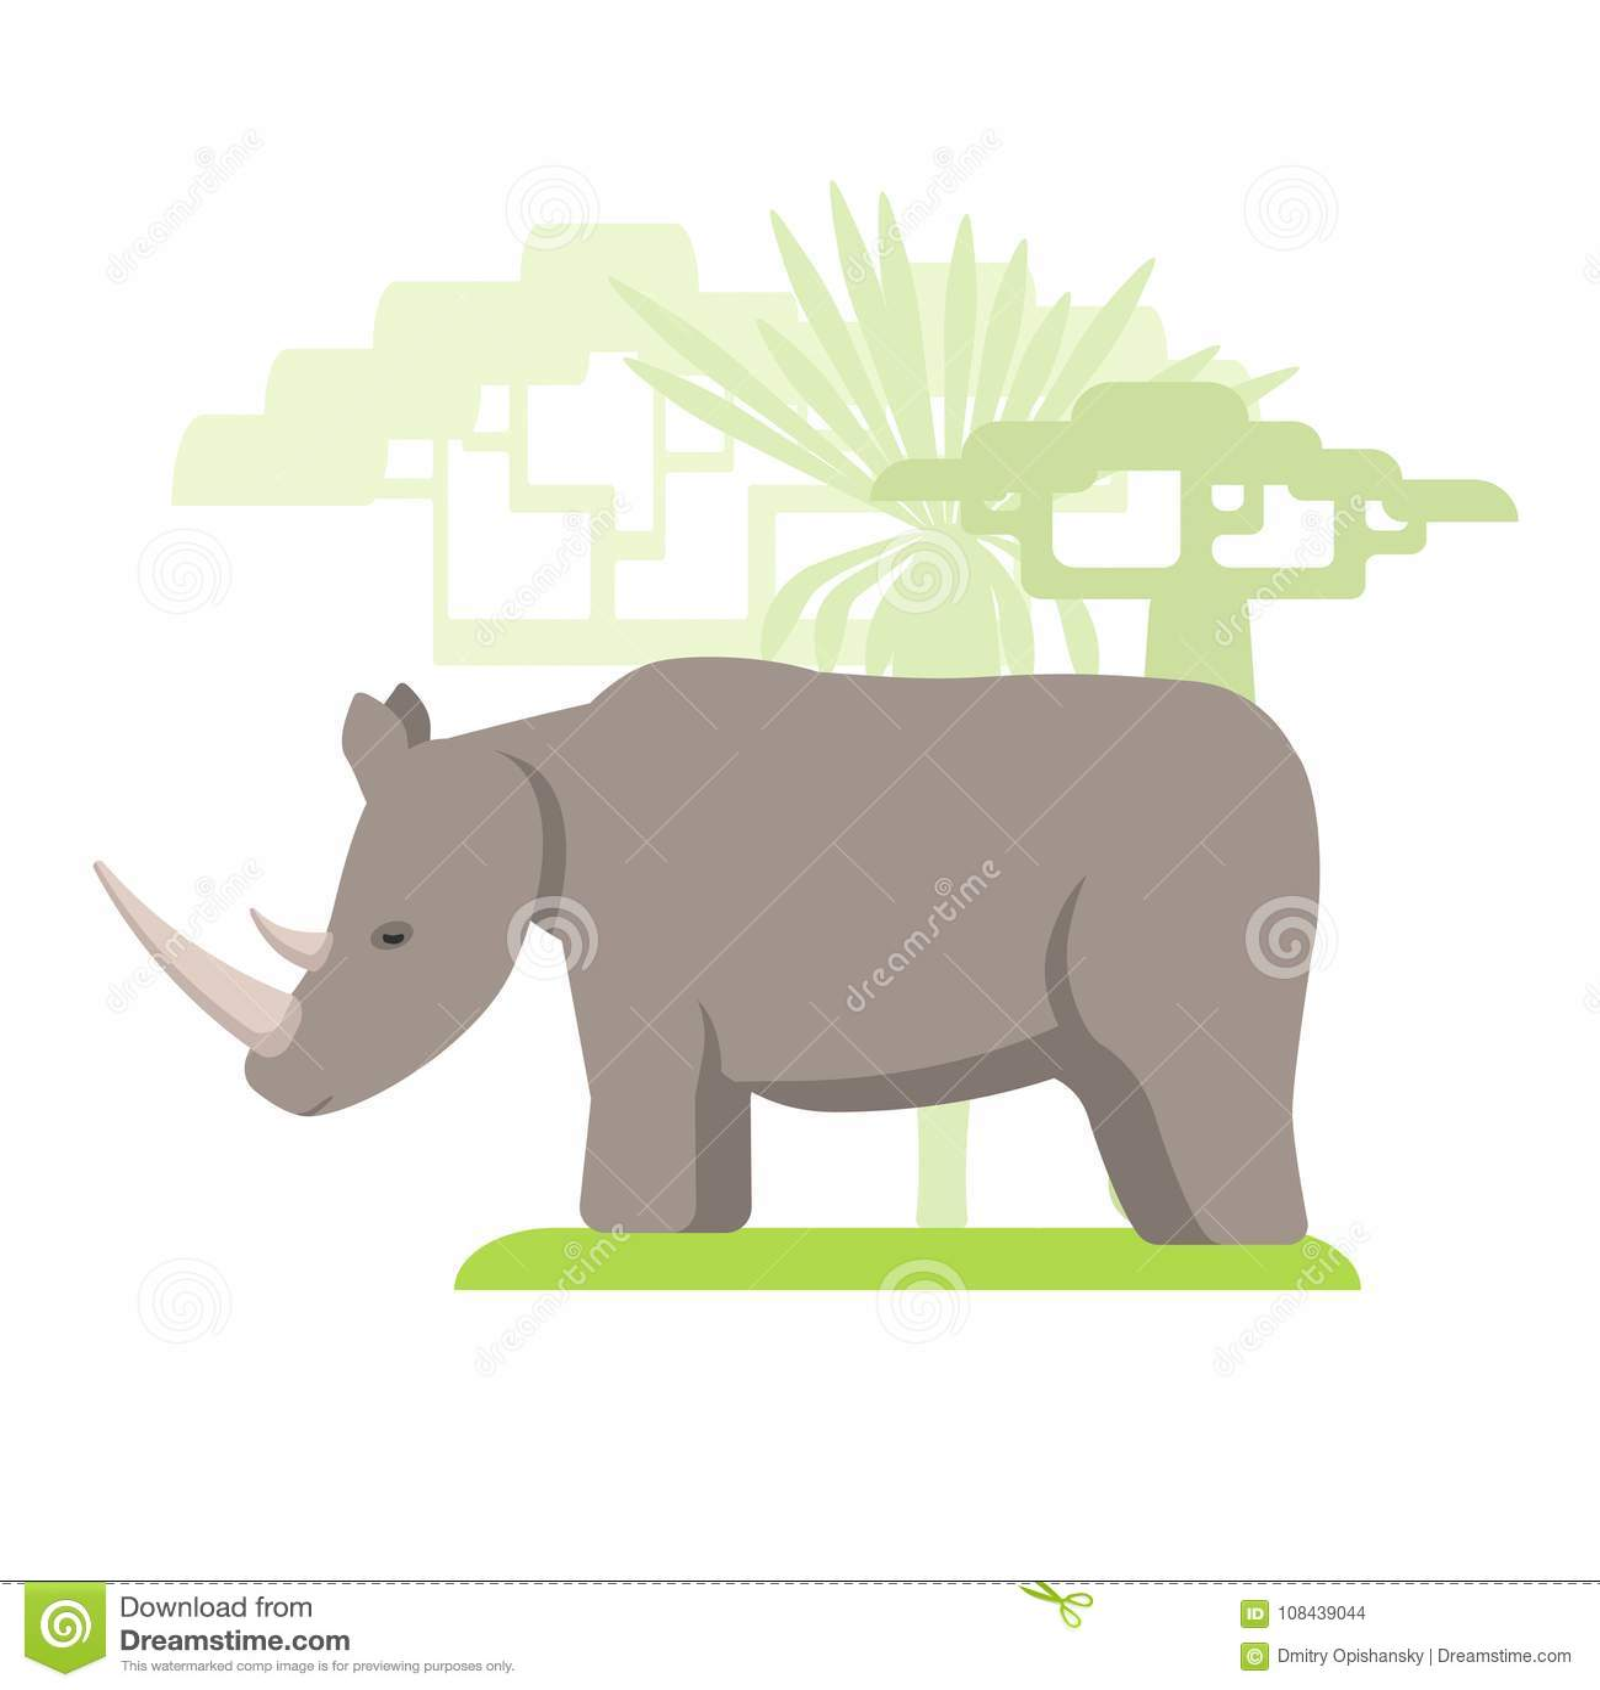 Cartoon Rhinoceros And Rocket Alphabet Tracing Worksheet